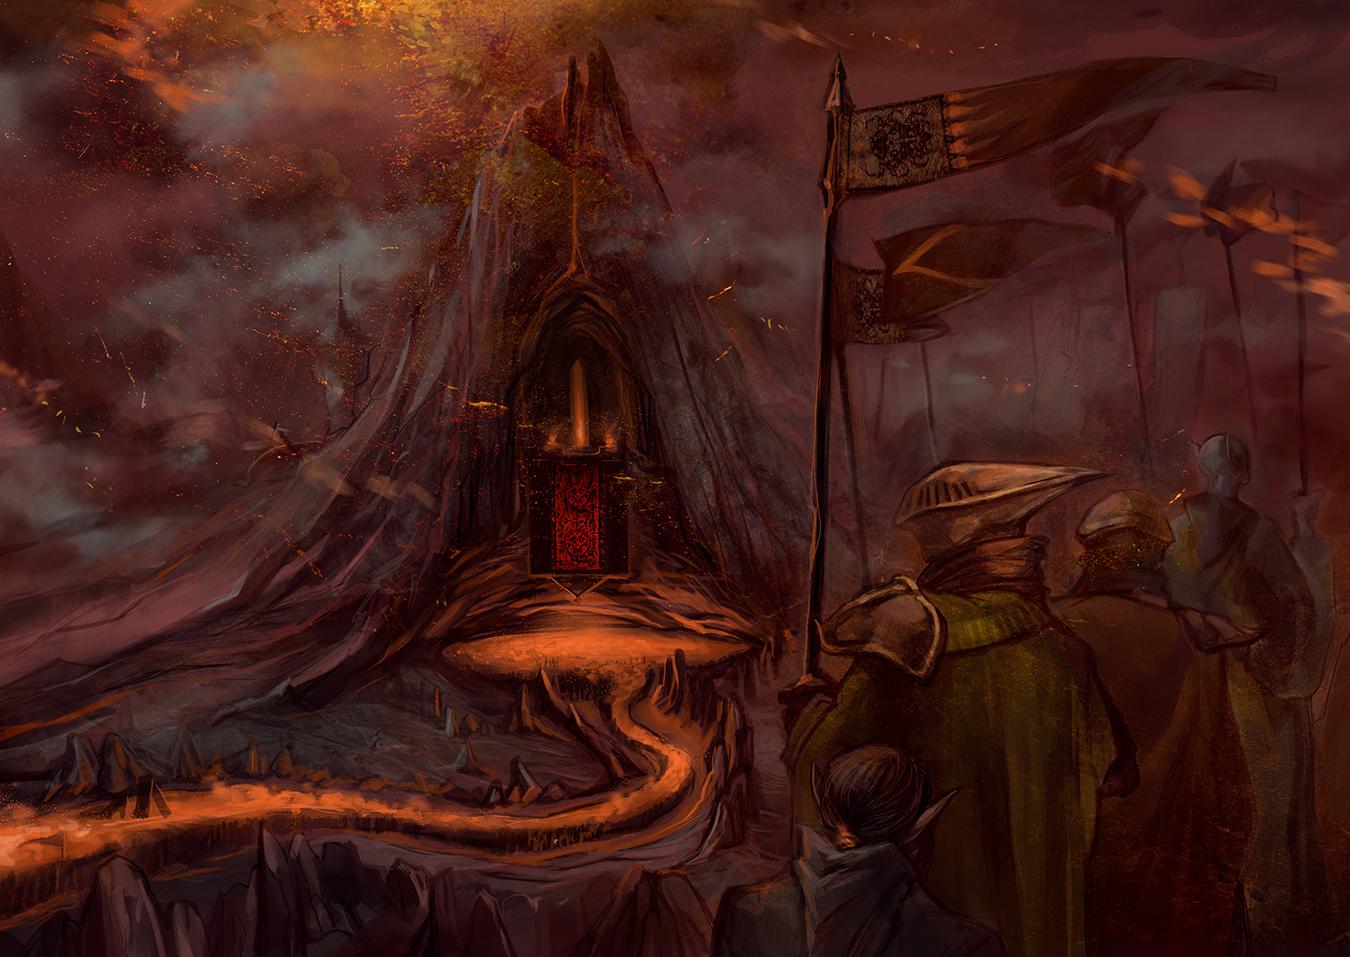 The elder scrolls iii morrowind computer wallpapers - Morrowind wallpaper ...